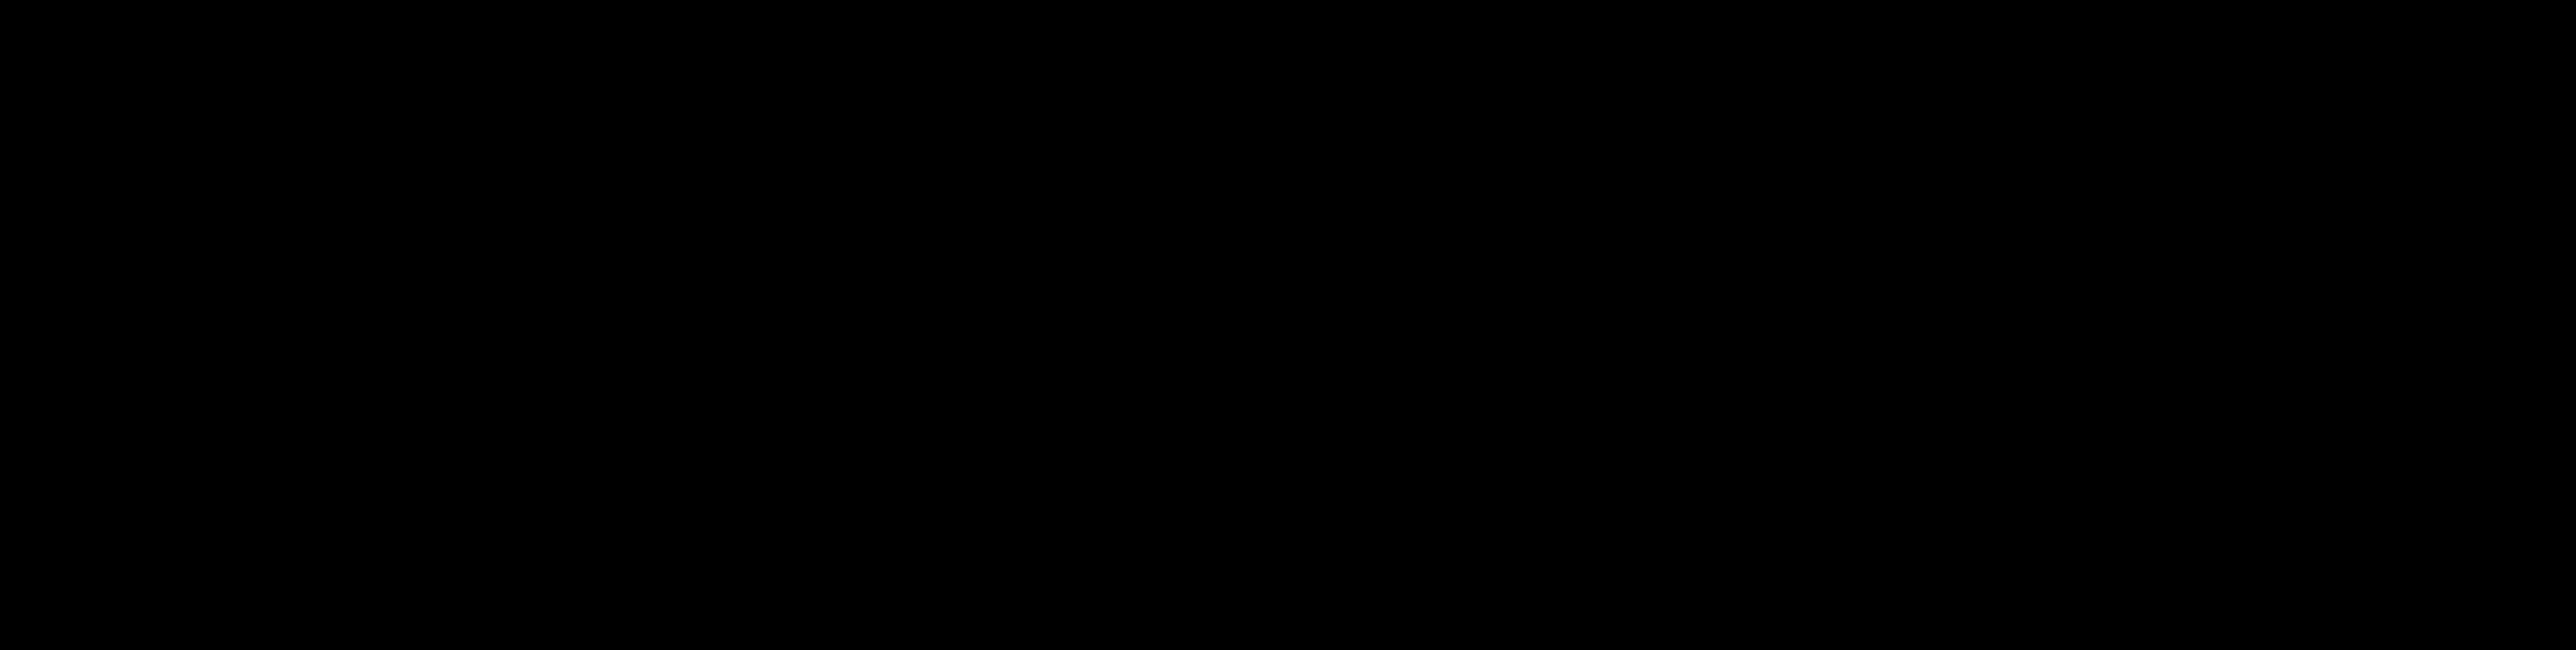 Conexionado DHAA